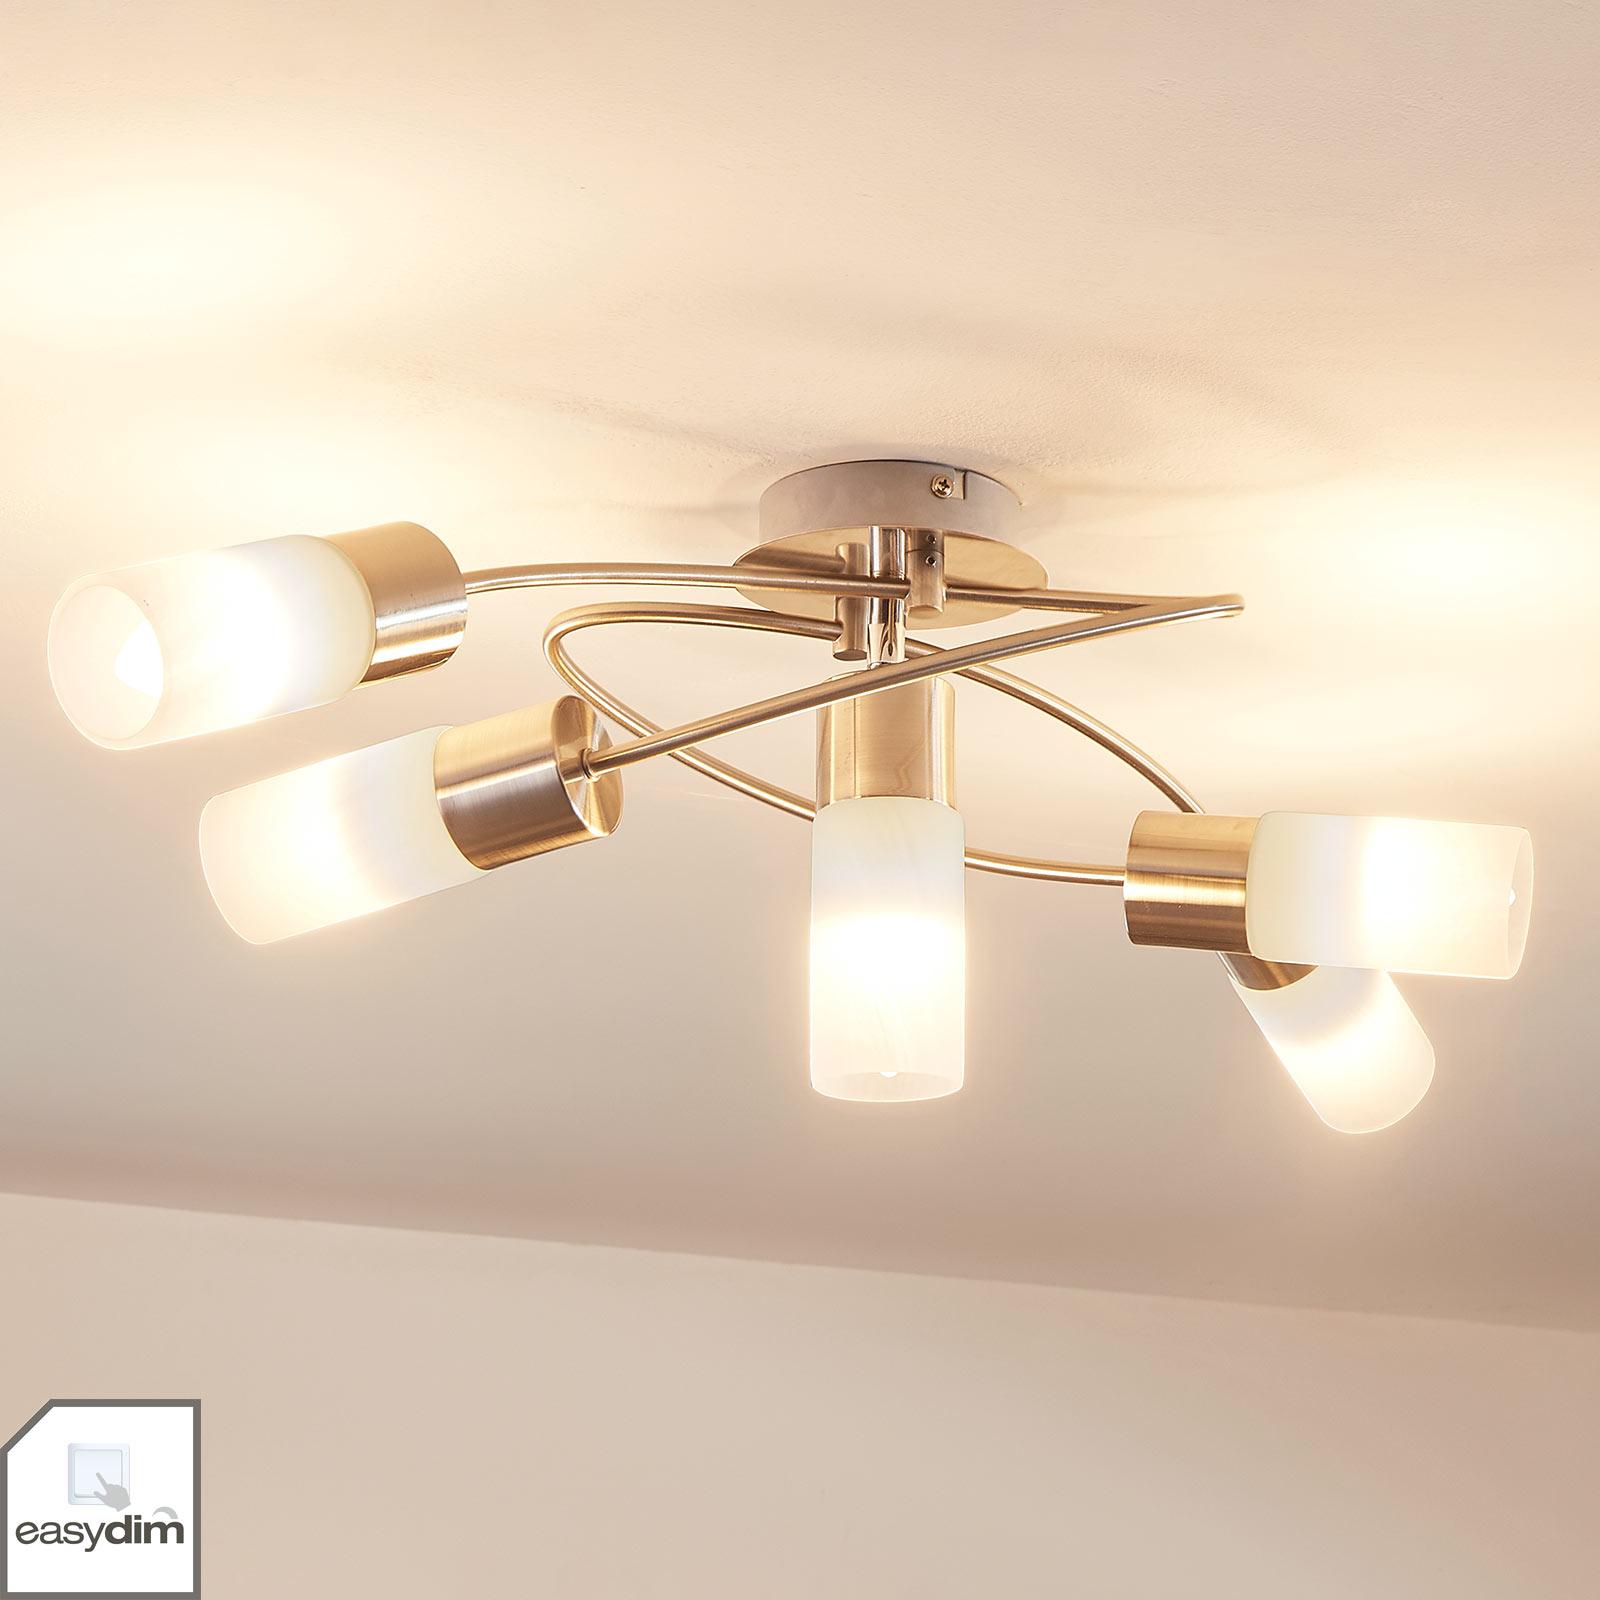 5.lamps dimbare LED plafondlamp Erva